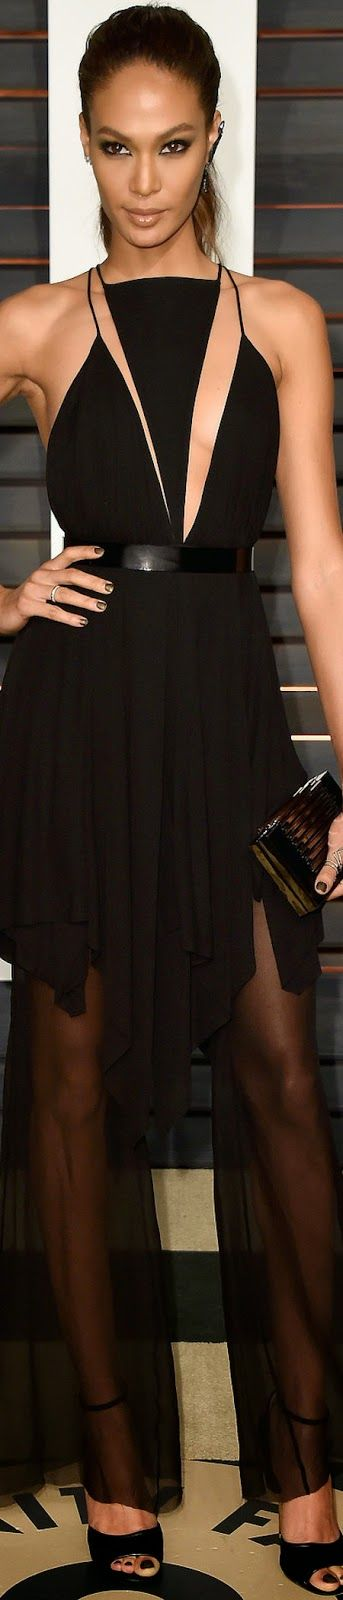 Joan Smalls in Balmain 2015 Vanity Fair Oscar Party